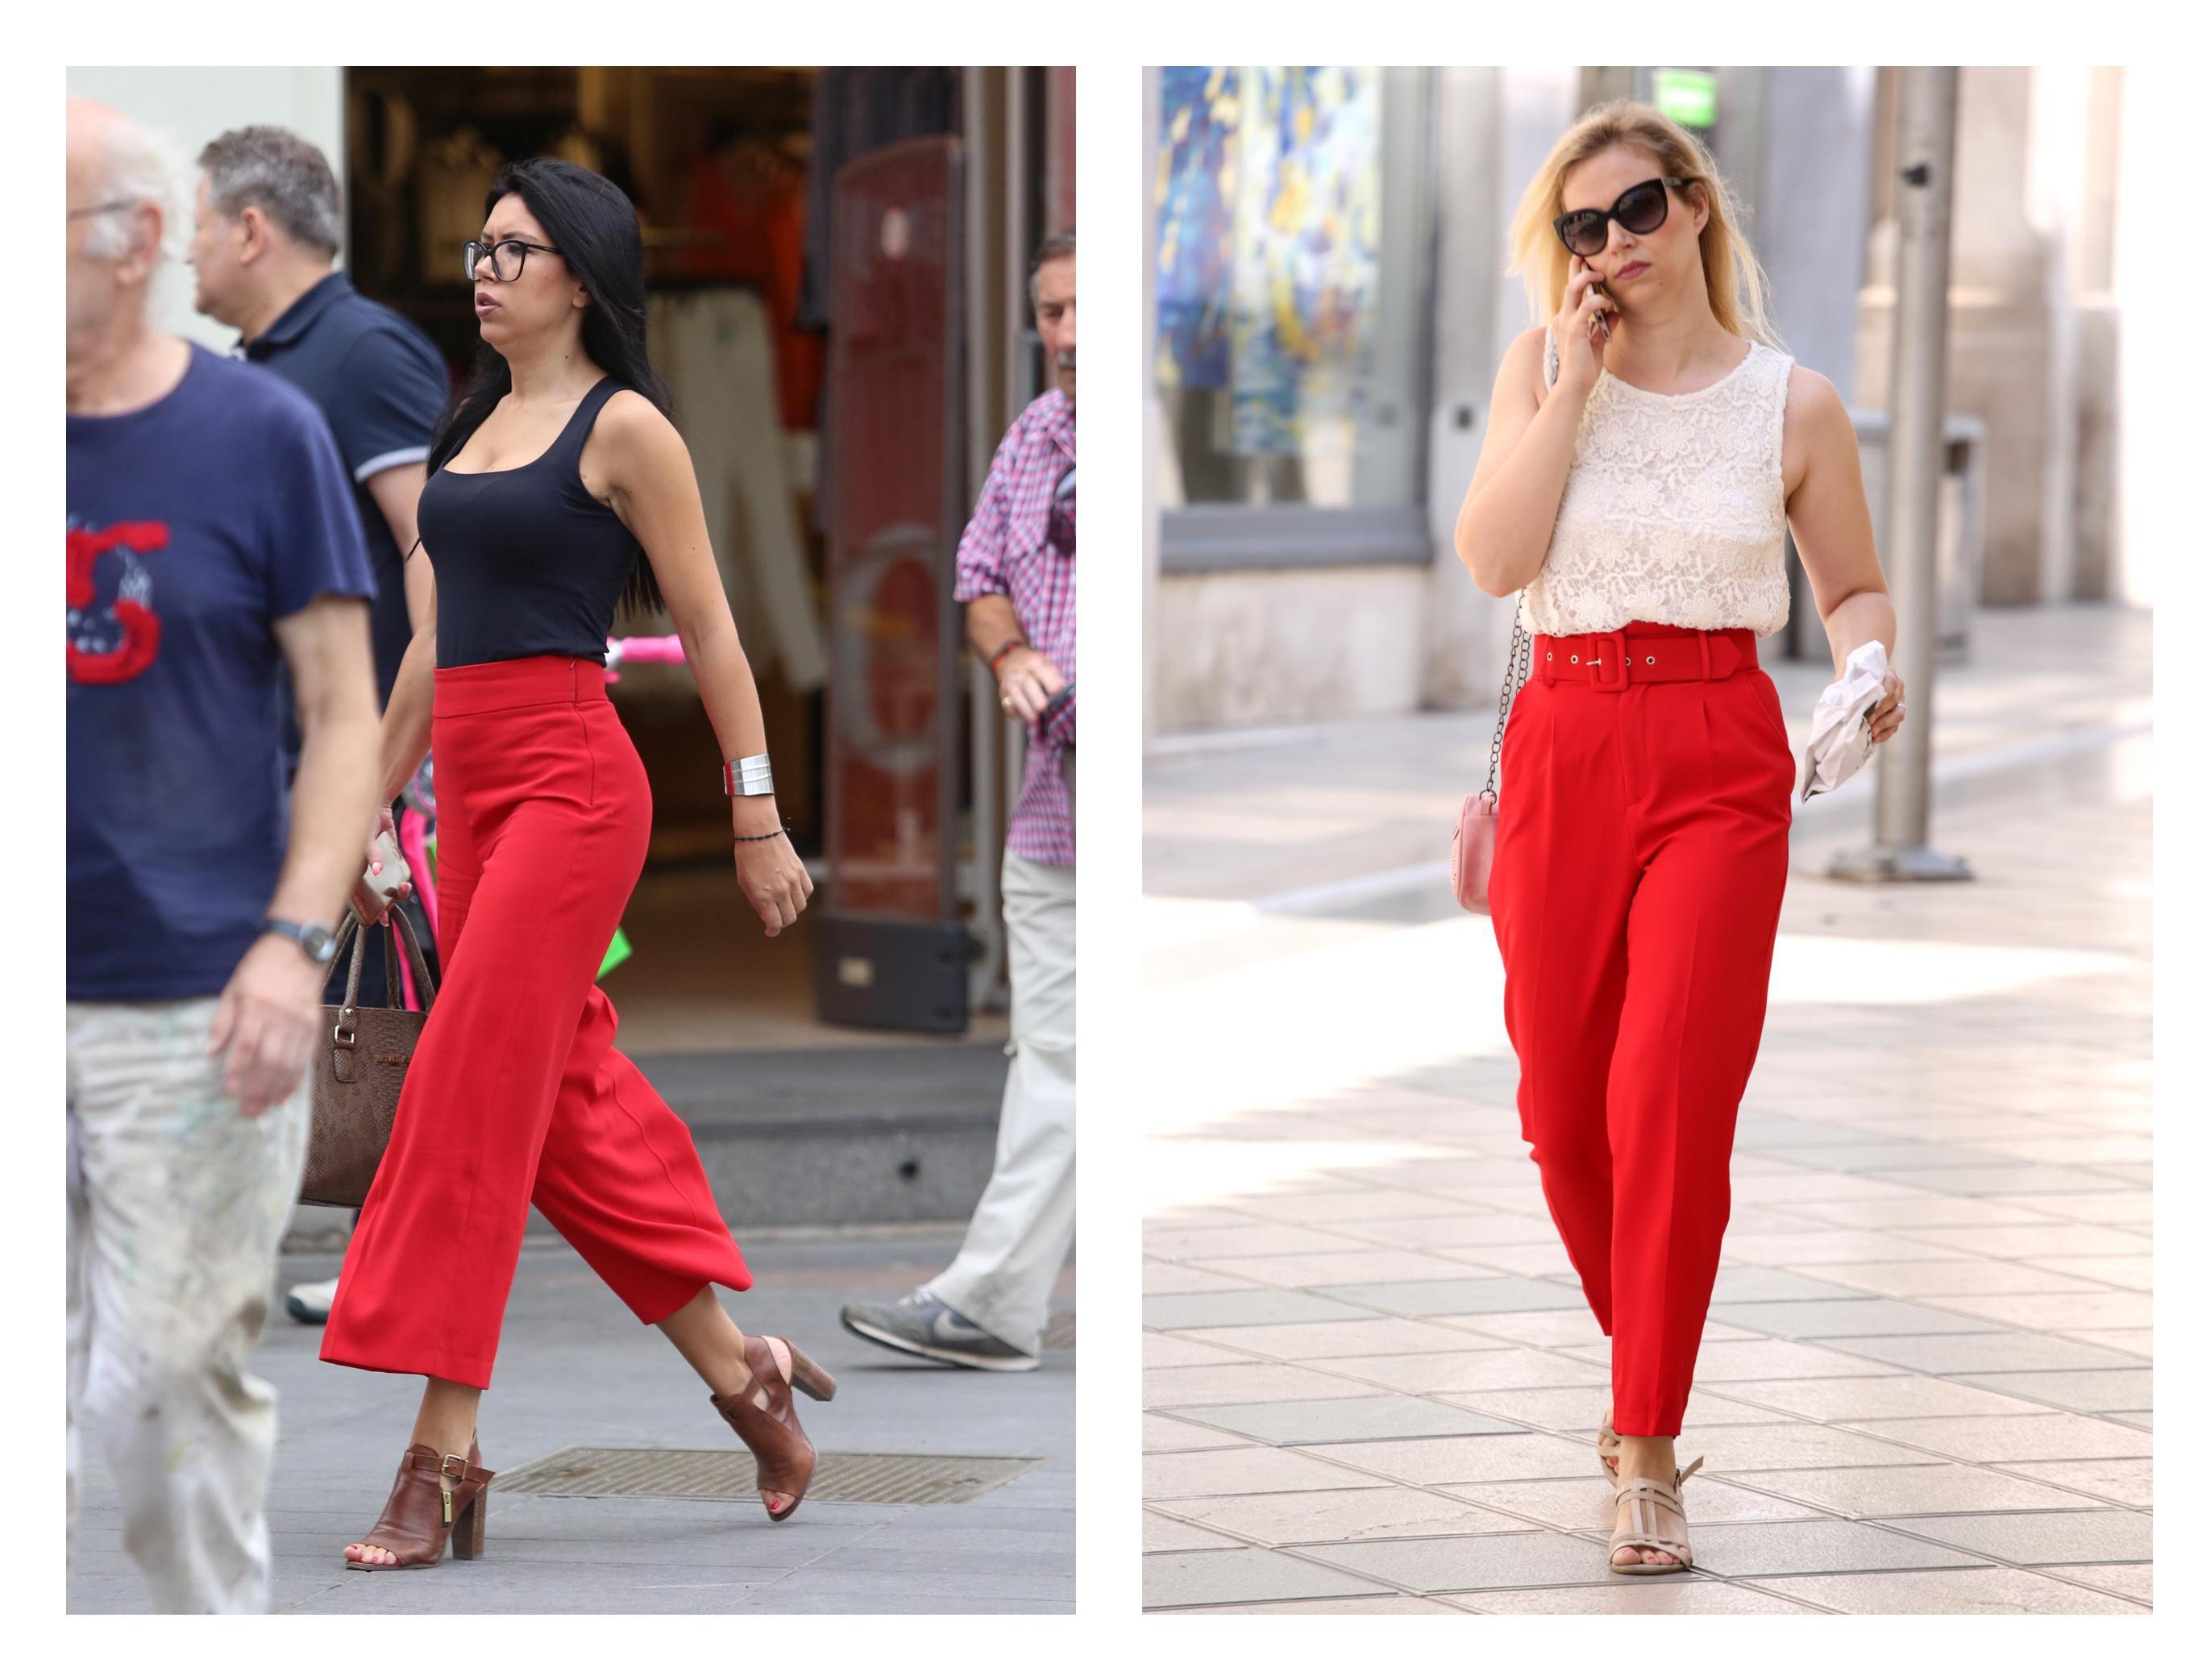 Tko bolje nosi hit hlače - zanosna brineta sa špice ili zgodna plavuša sa splitske rive?